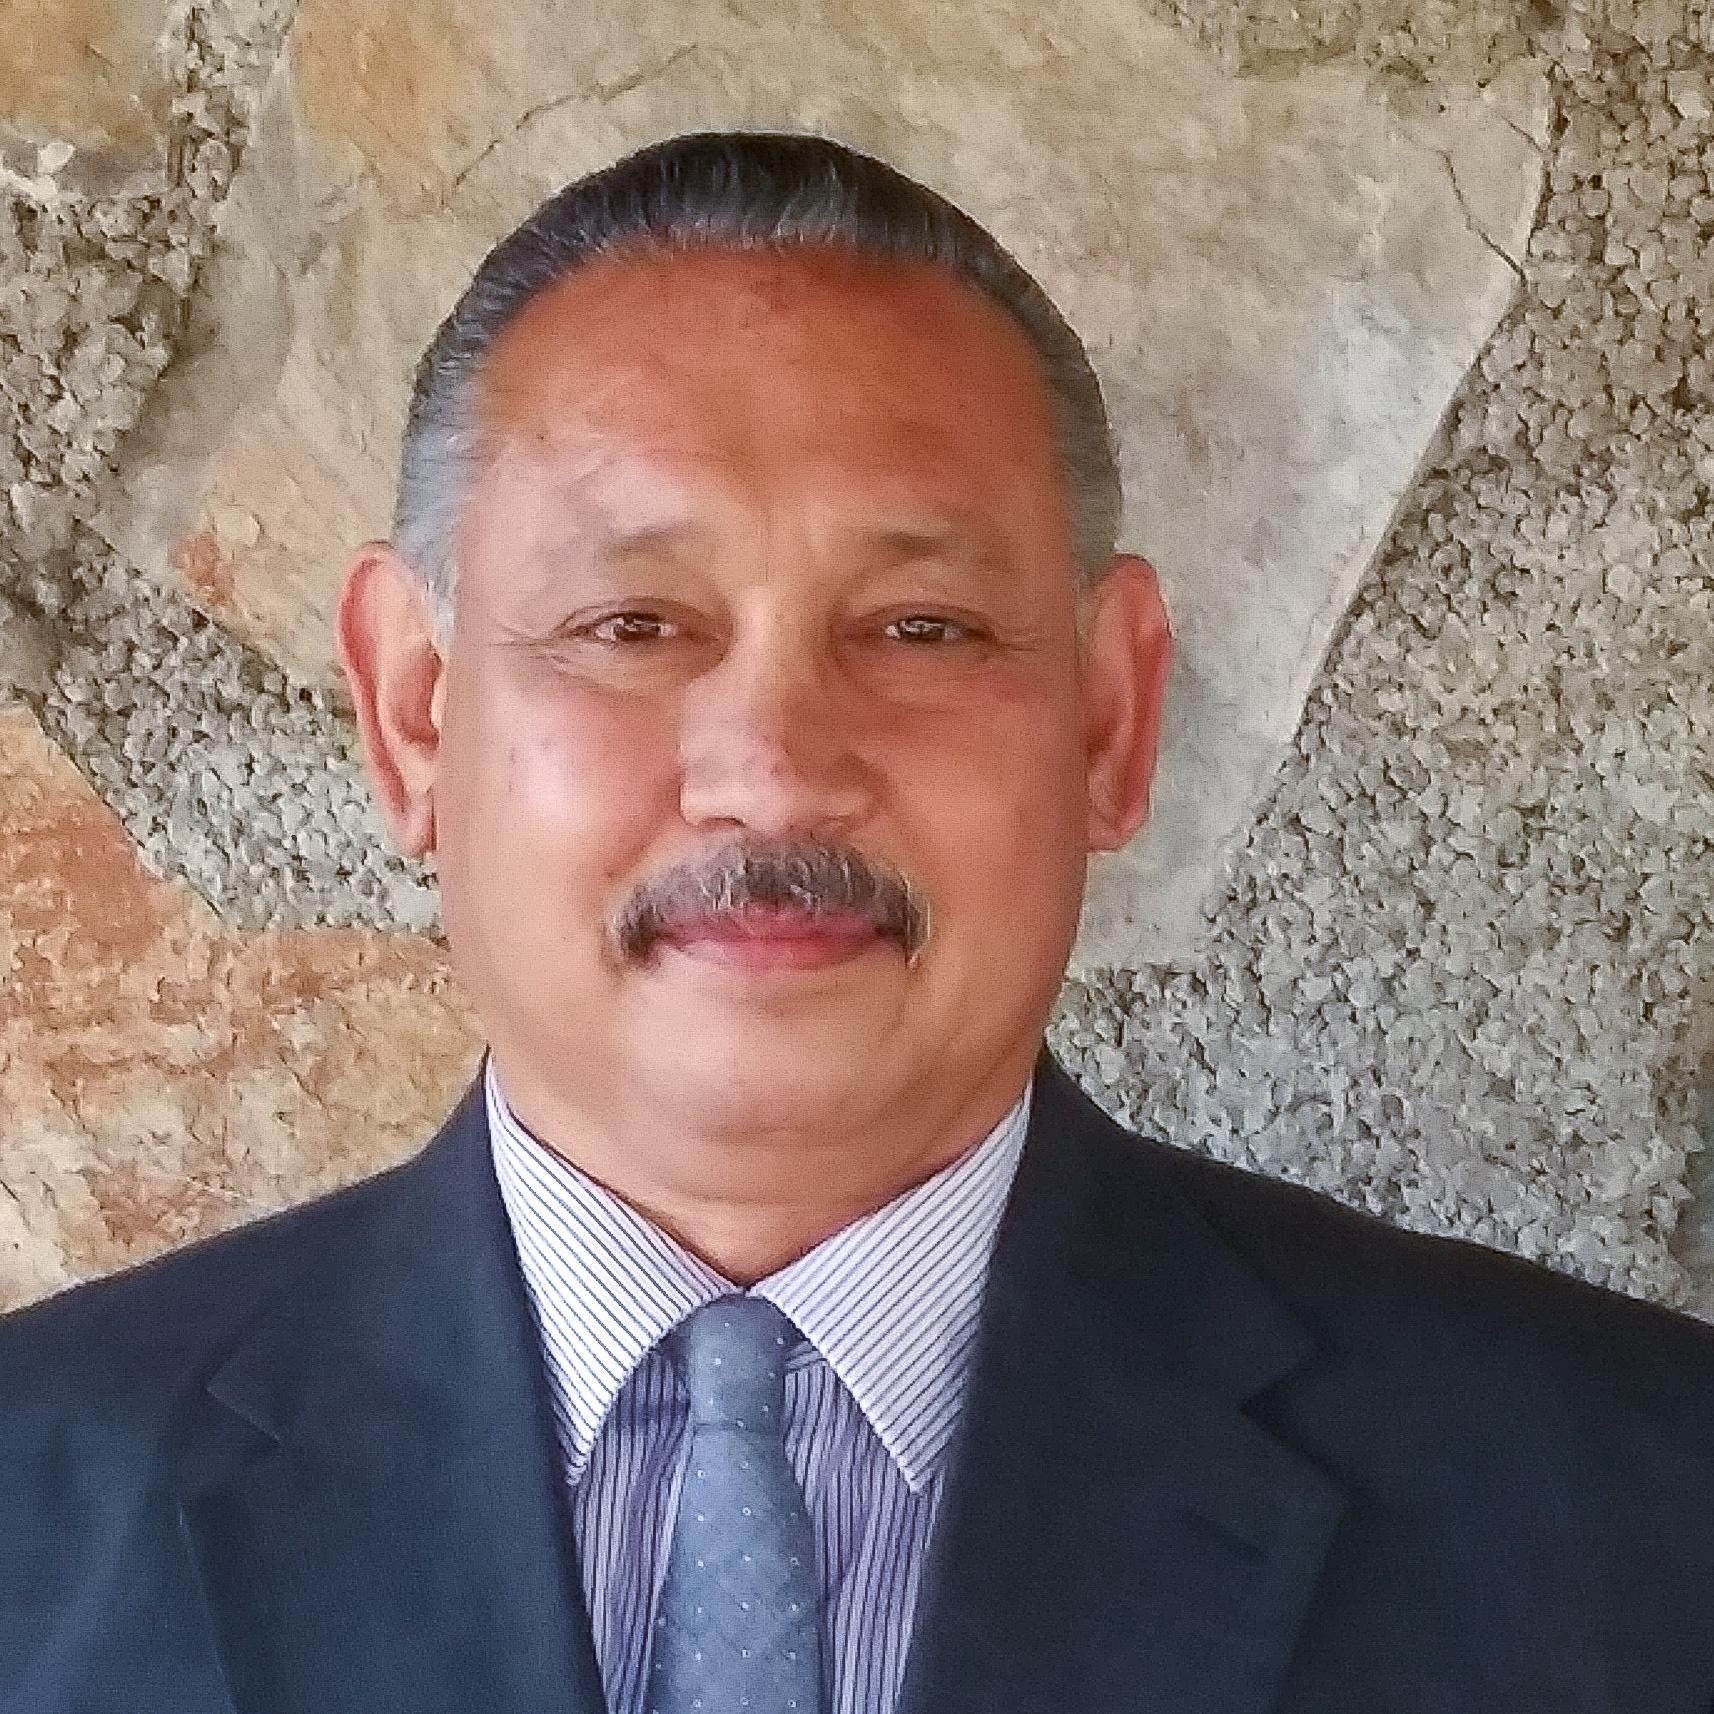 Abel Sambrano